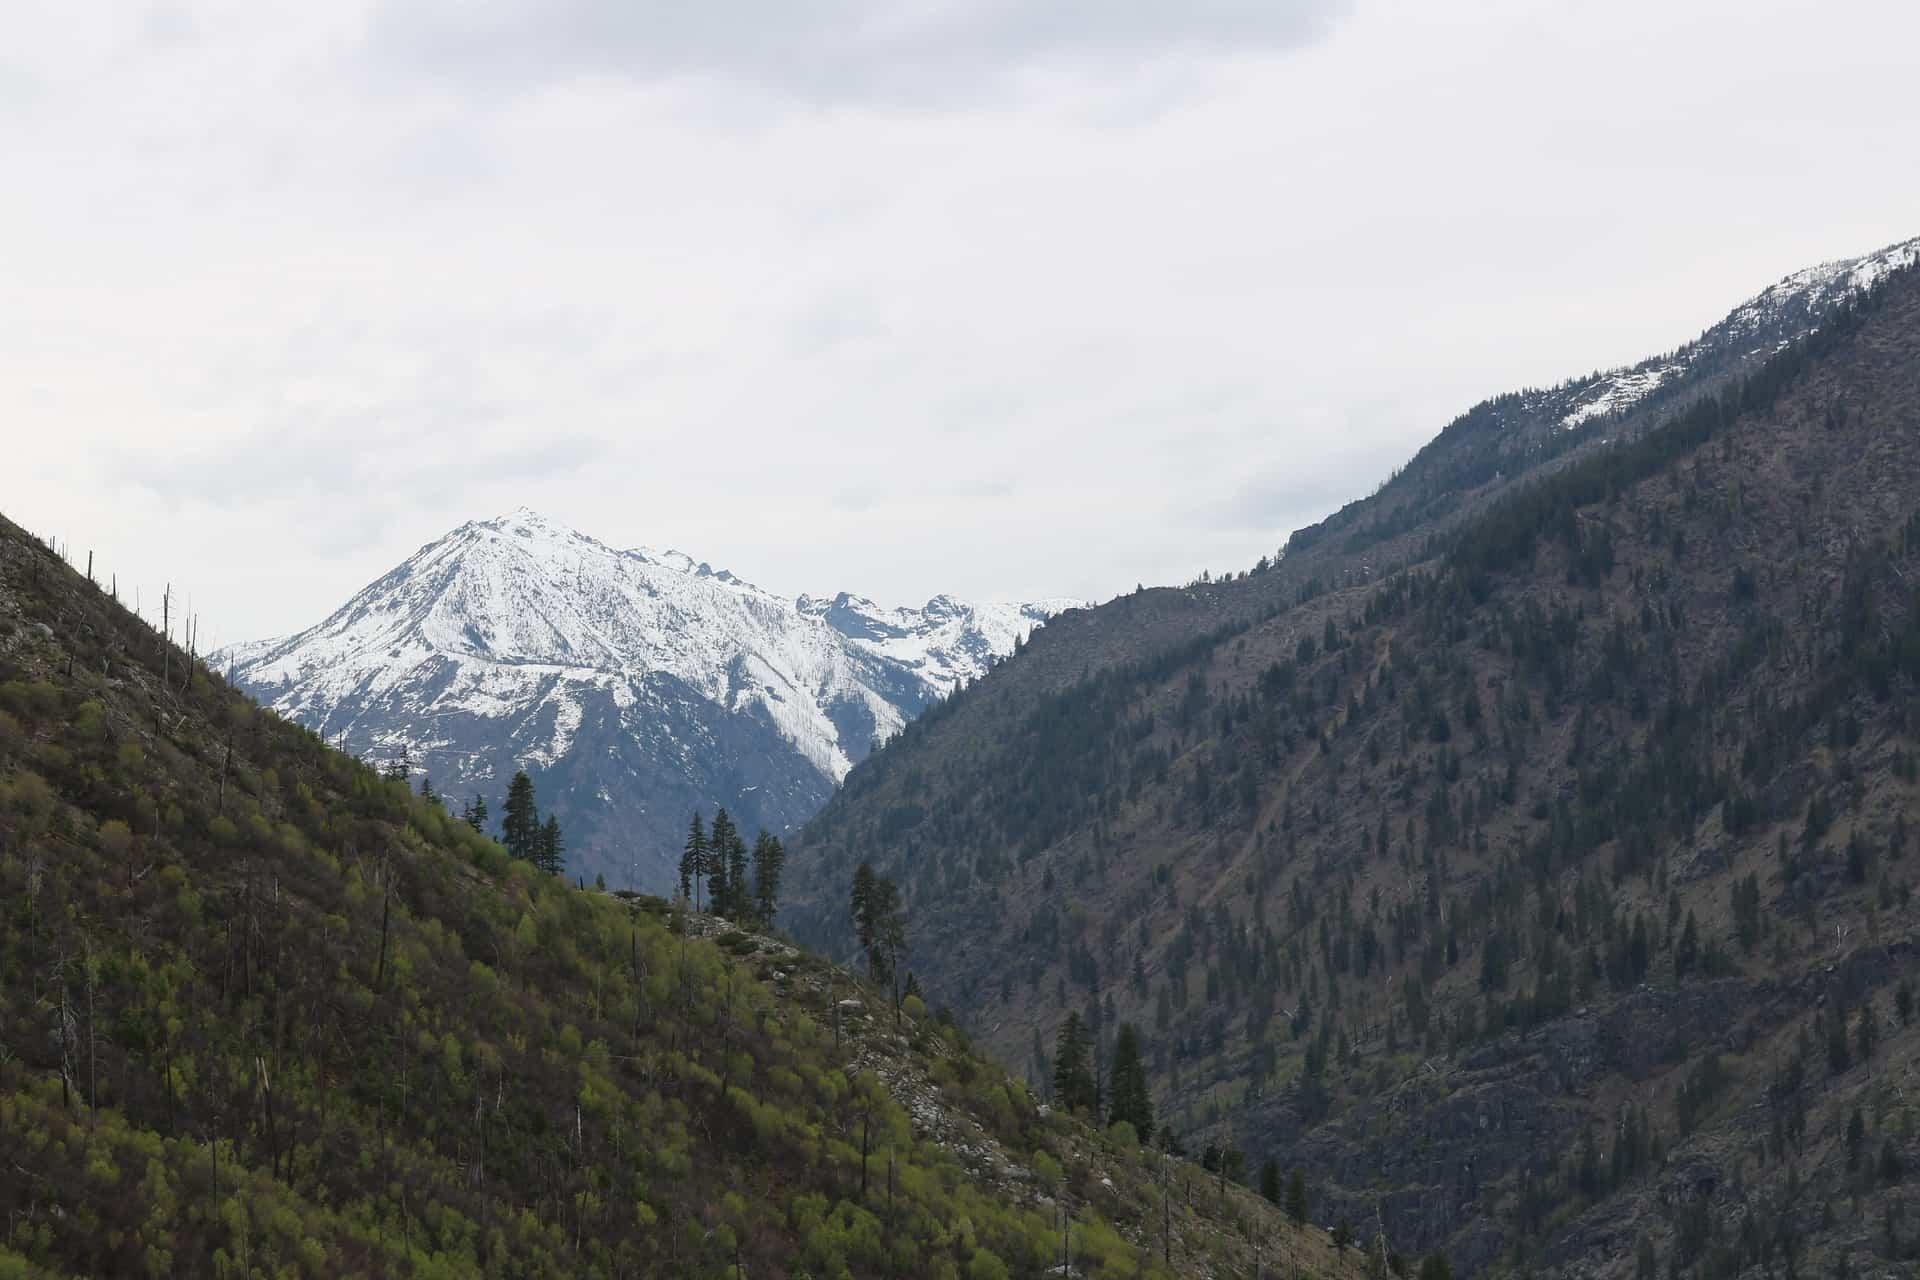 Landscape shot of Mount Rainier and surrounding mountains